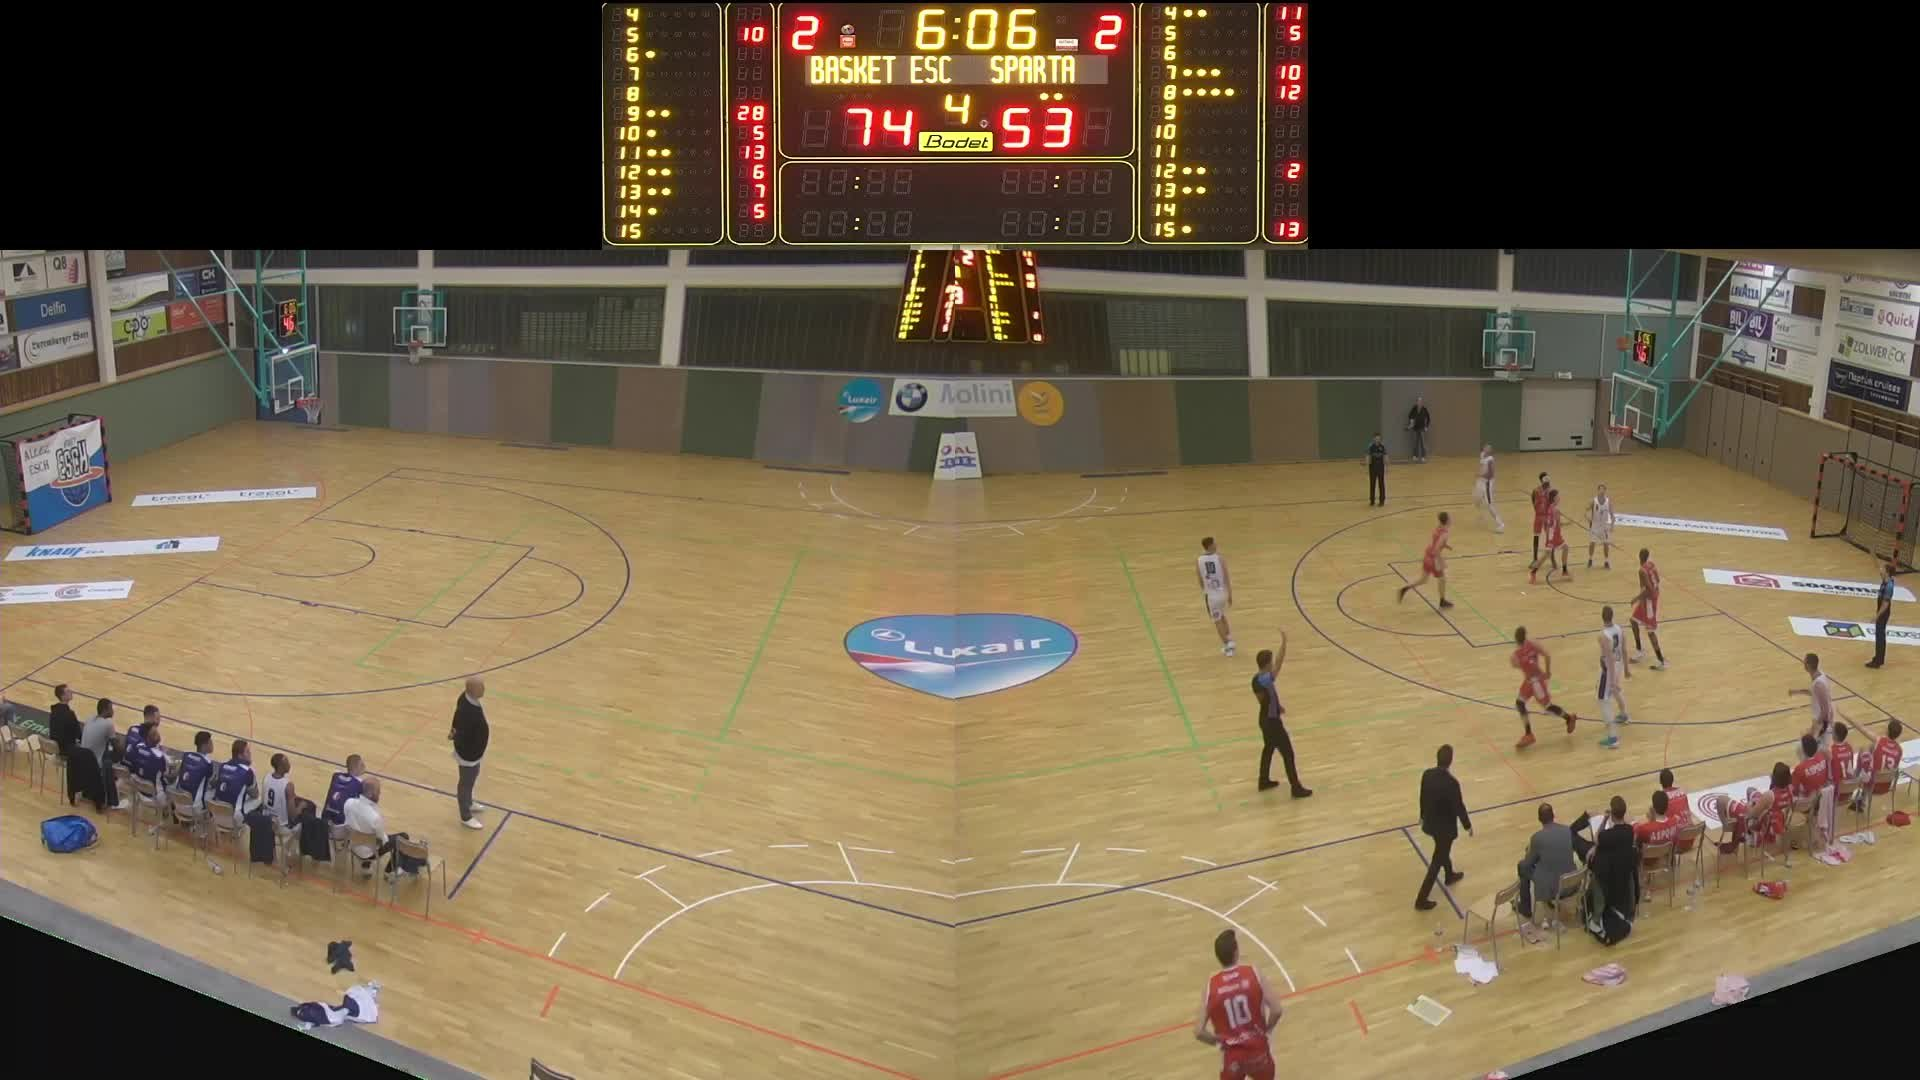 Basket Esch ( Seniors A ) - Sparta - 08.11.2019